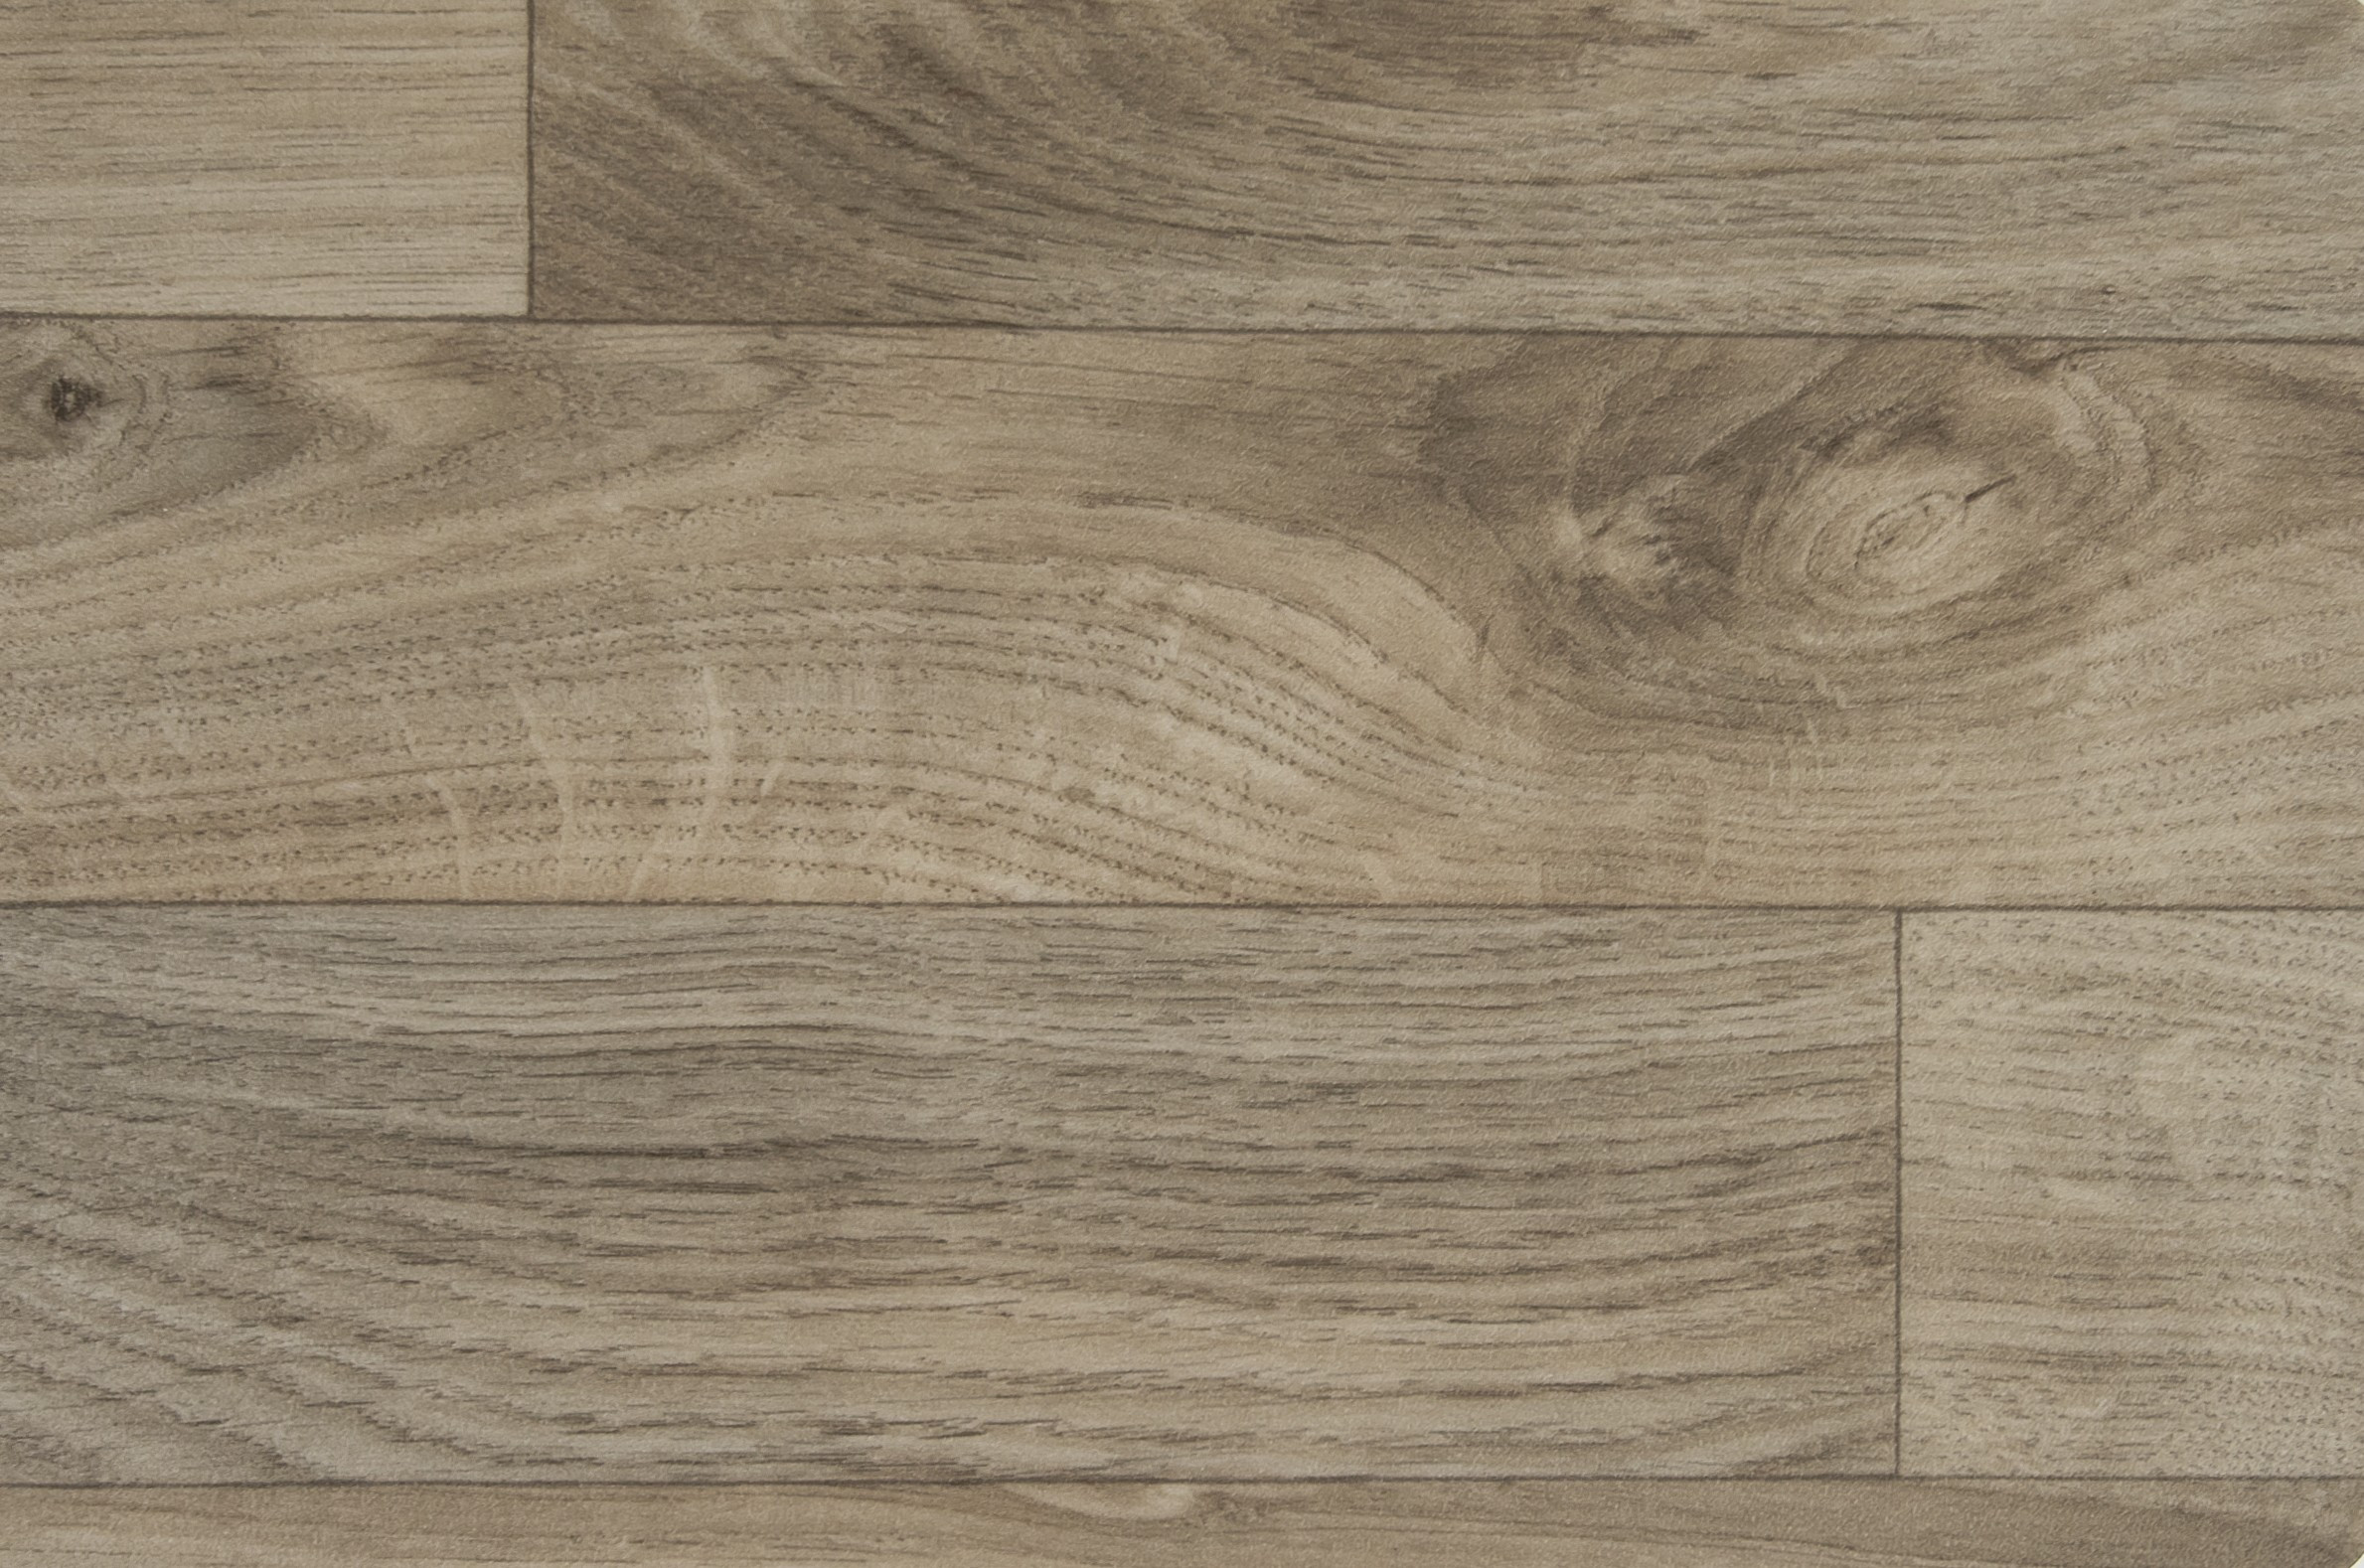 PVC podlaha Xtreme Honey Oak 961M - Rozměr na míru cm